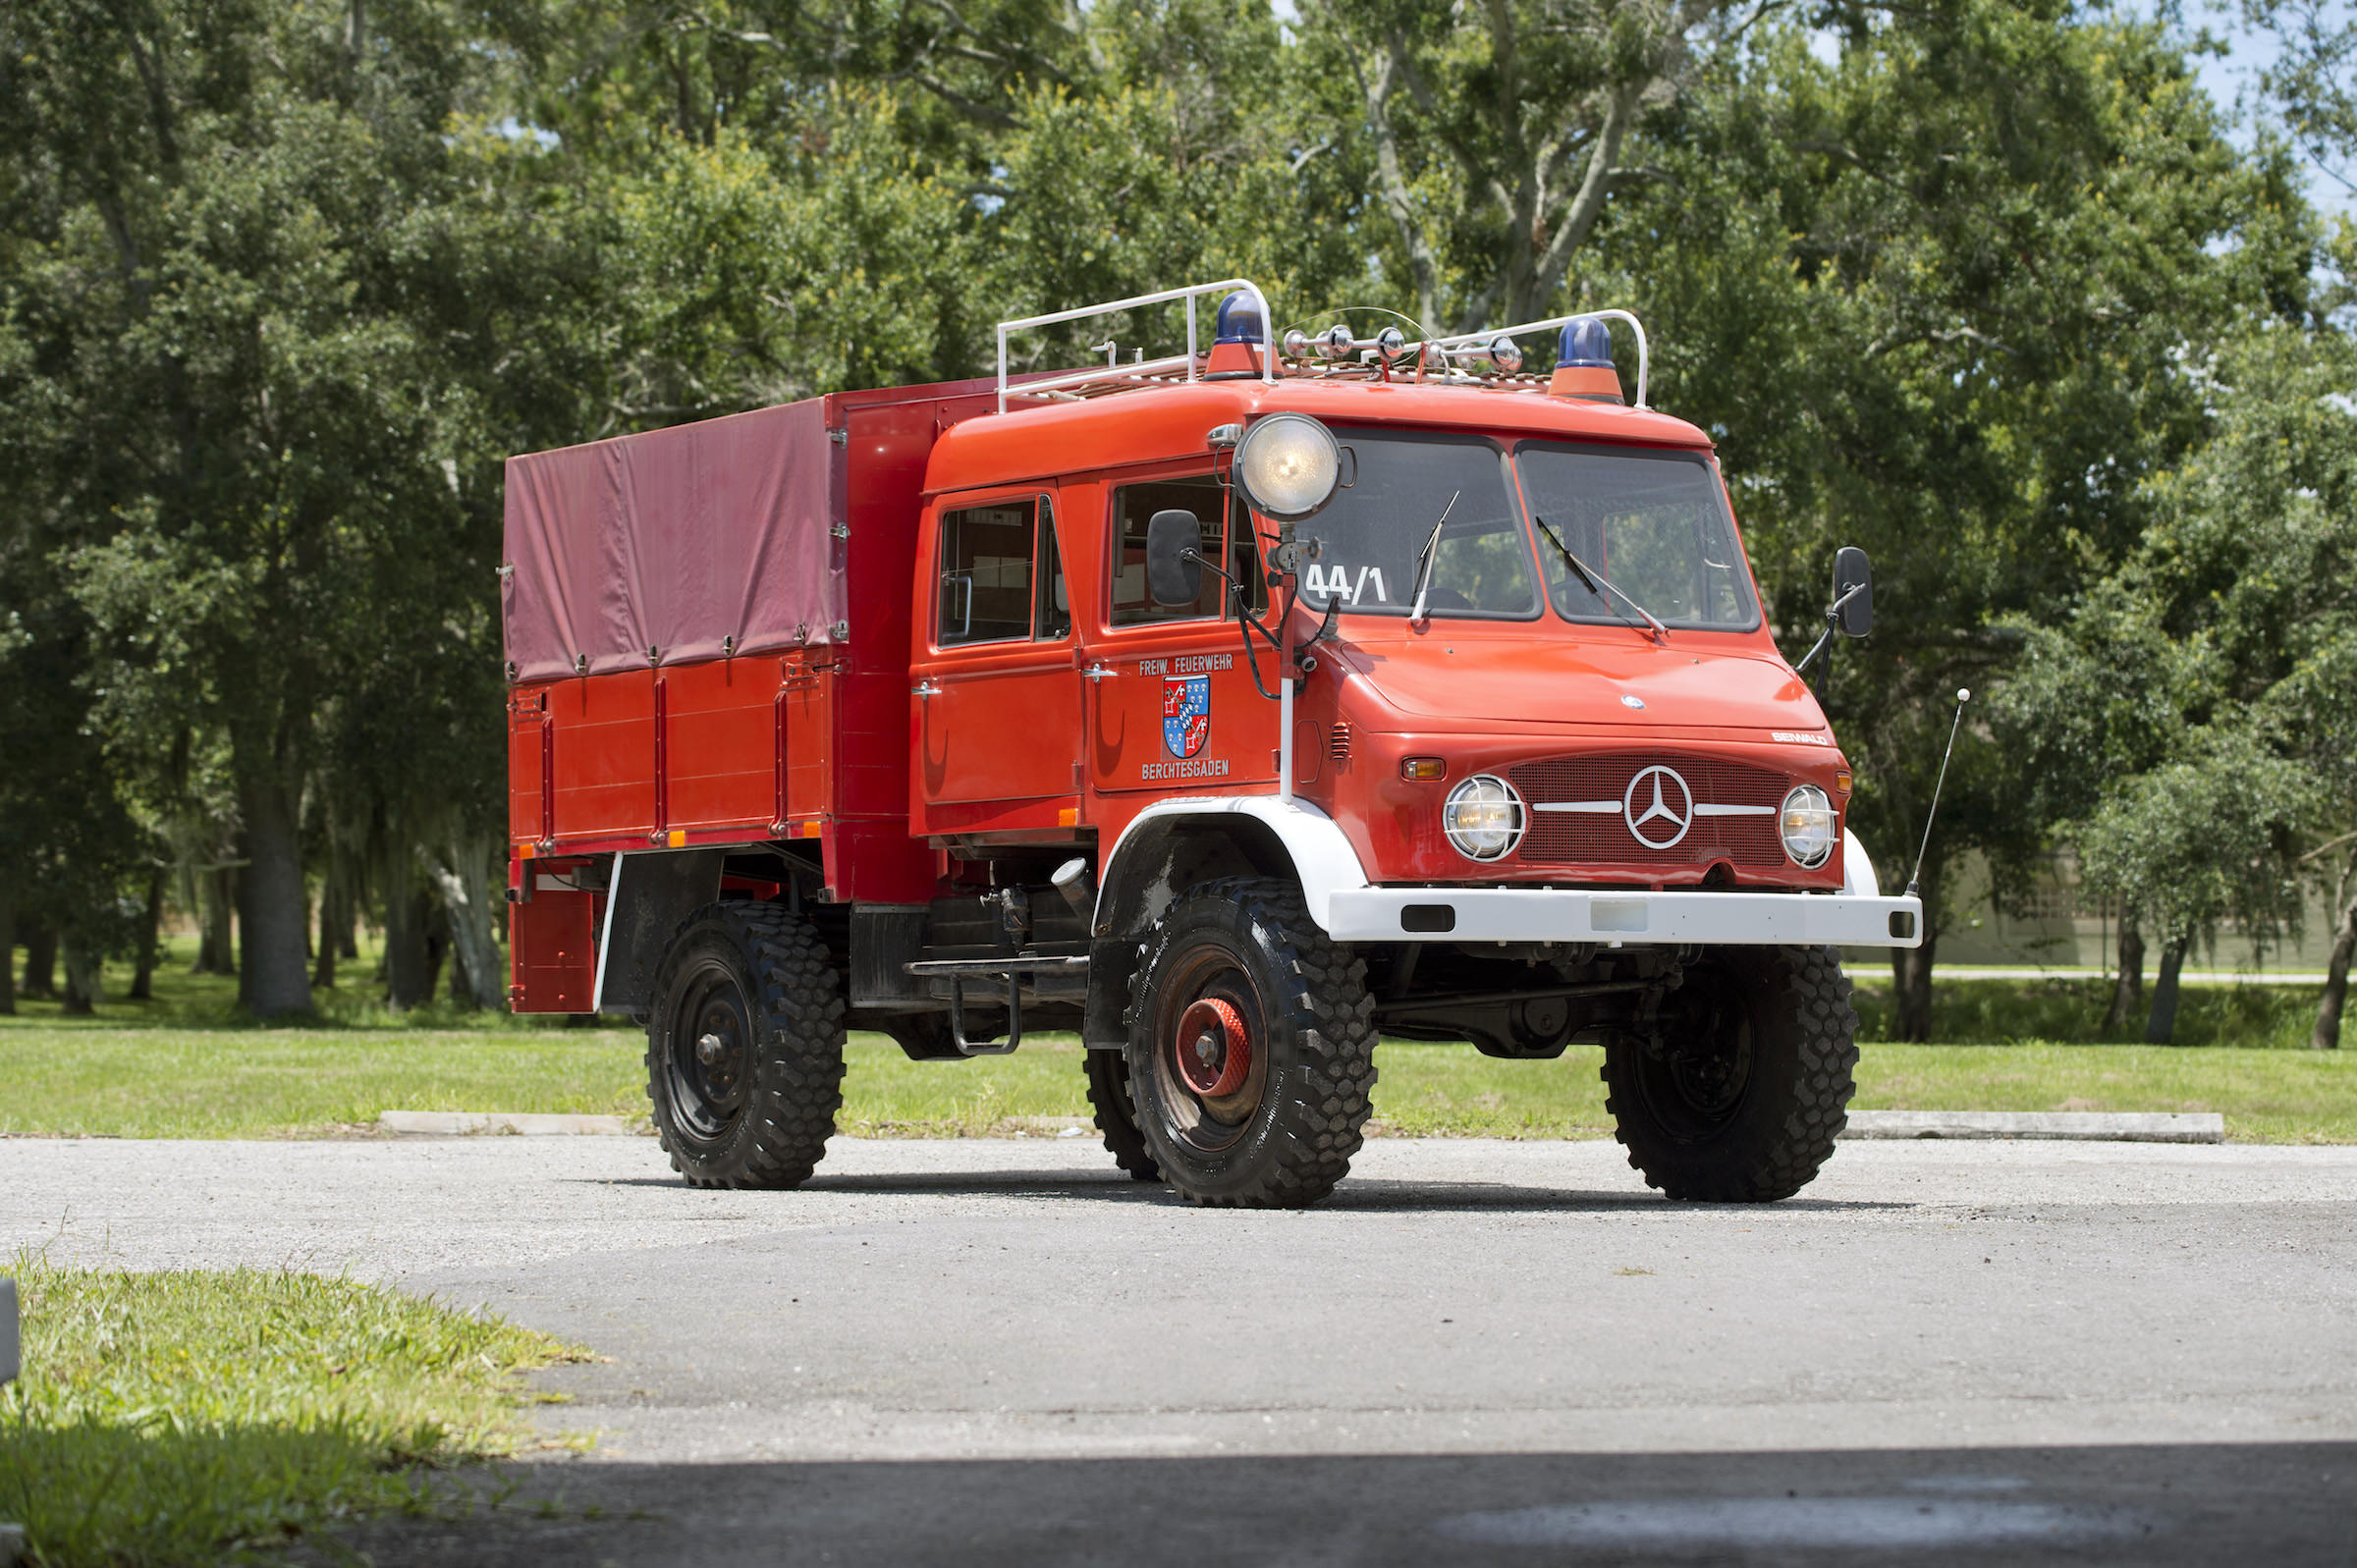 1968 Mercedes Benz Unimog 404 Mountain Rescue Fire Truck